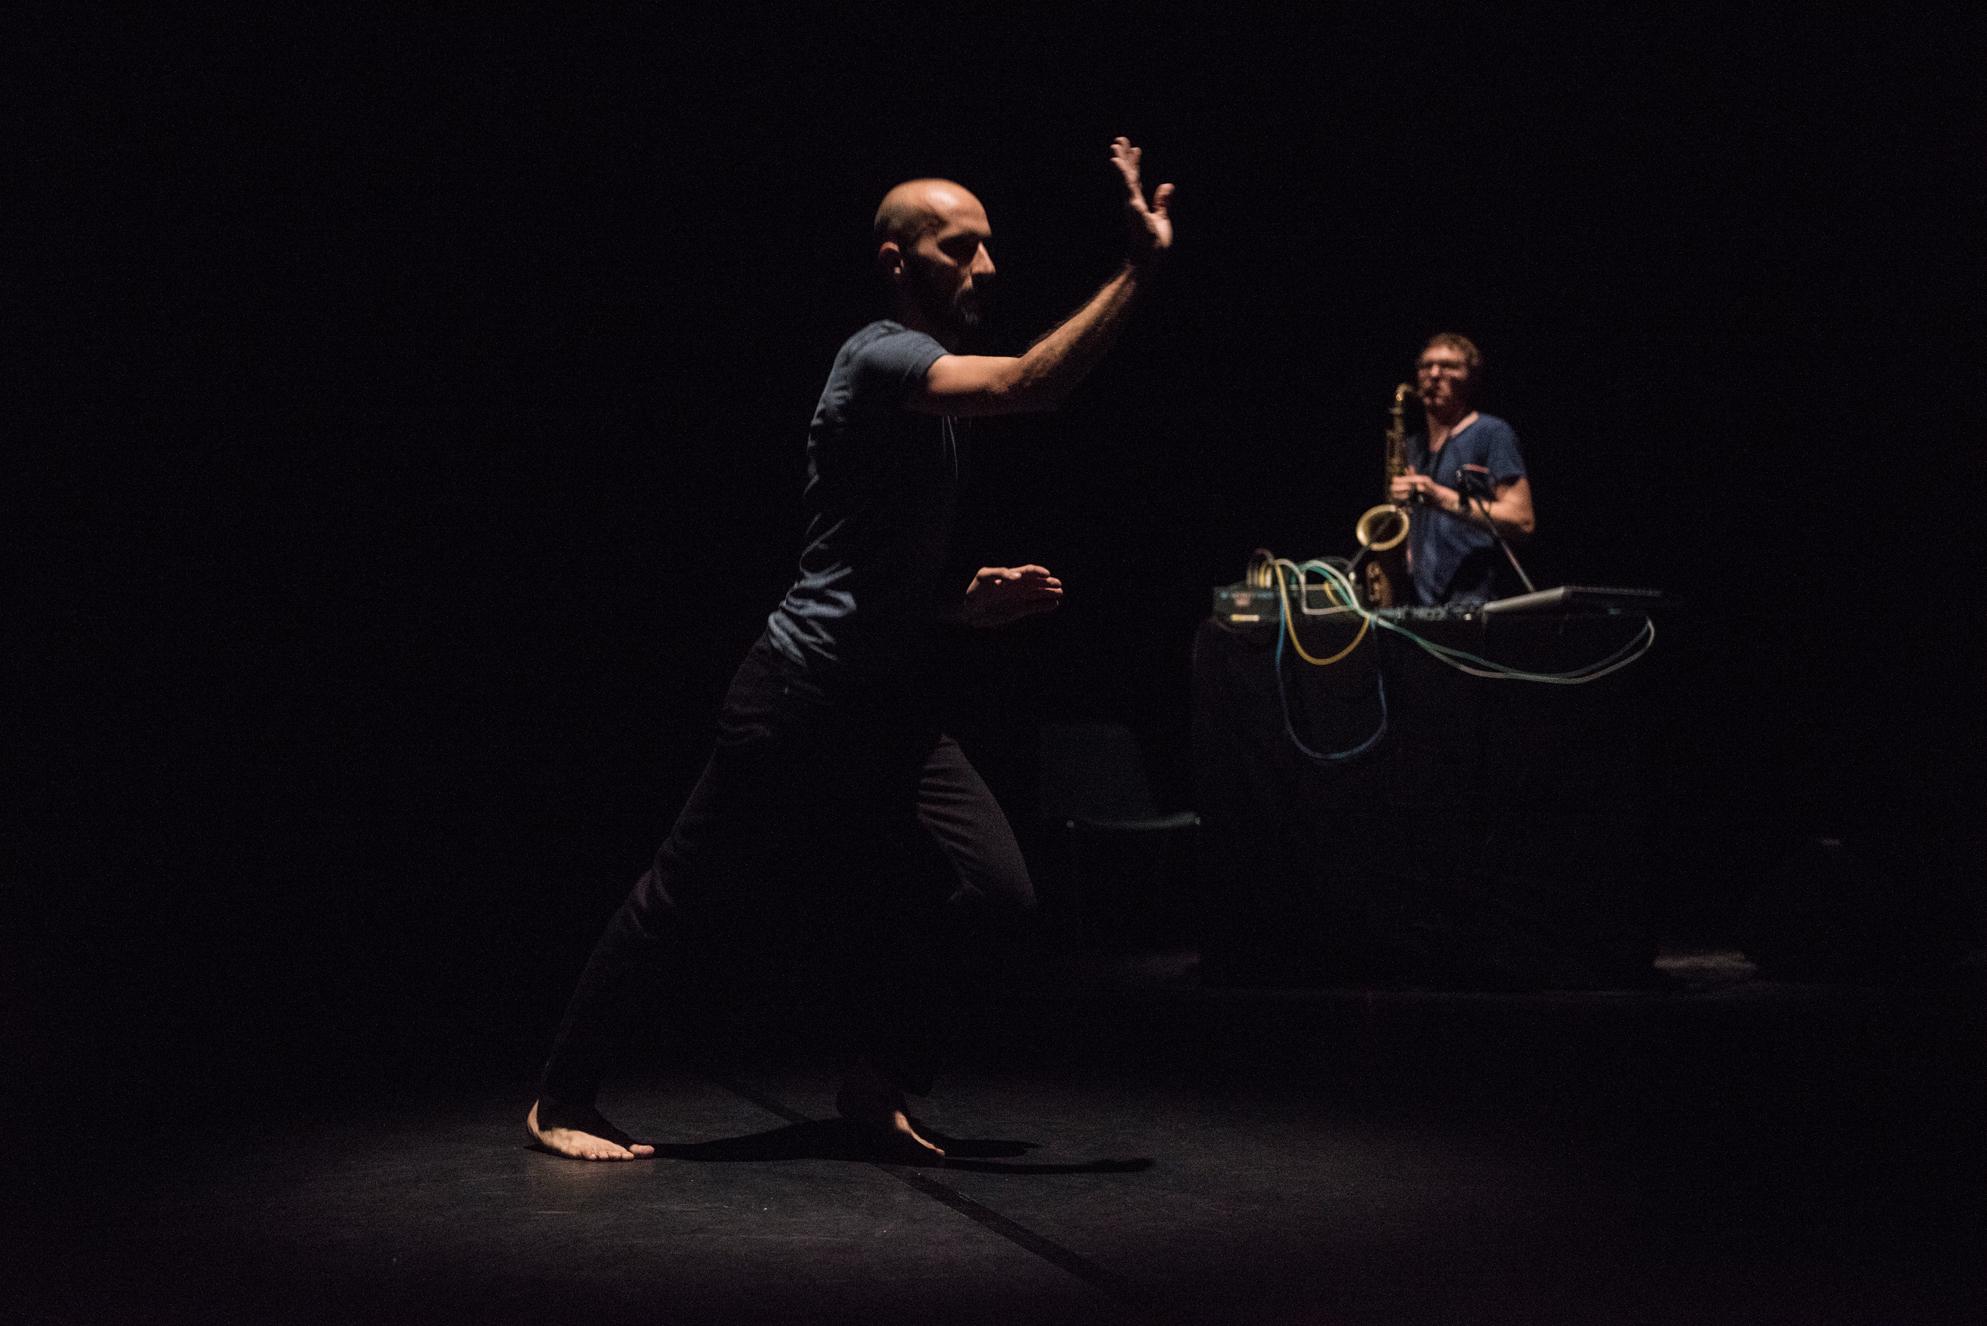 Kudoku – Daniele Ninarello & Dan Kinzelman